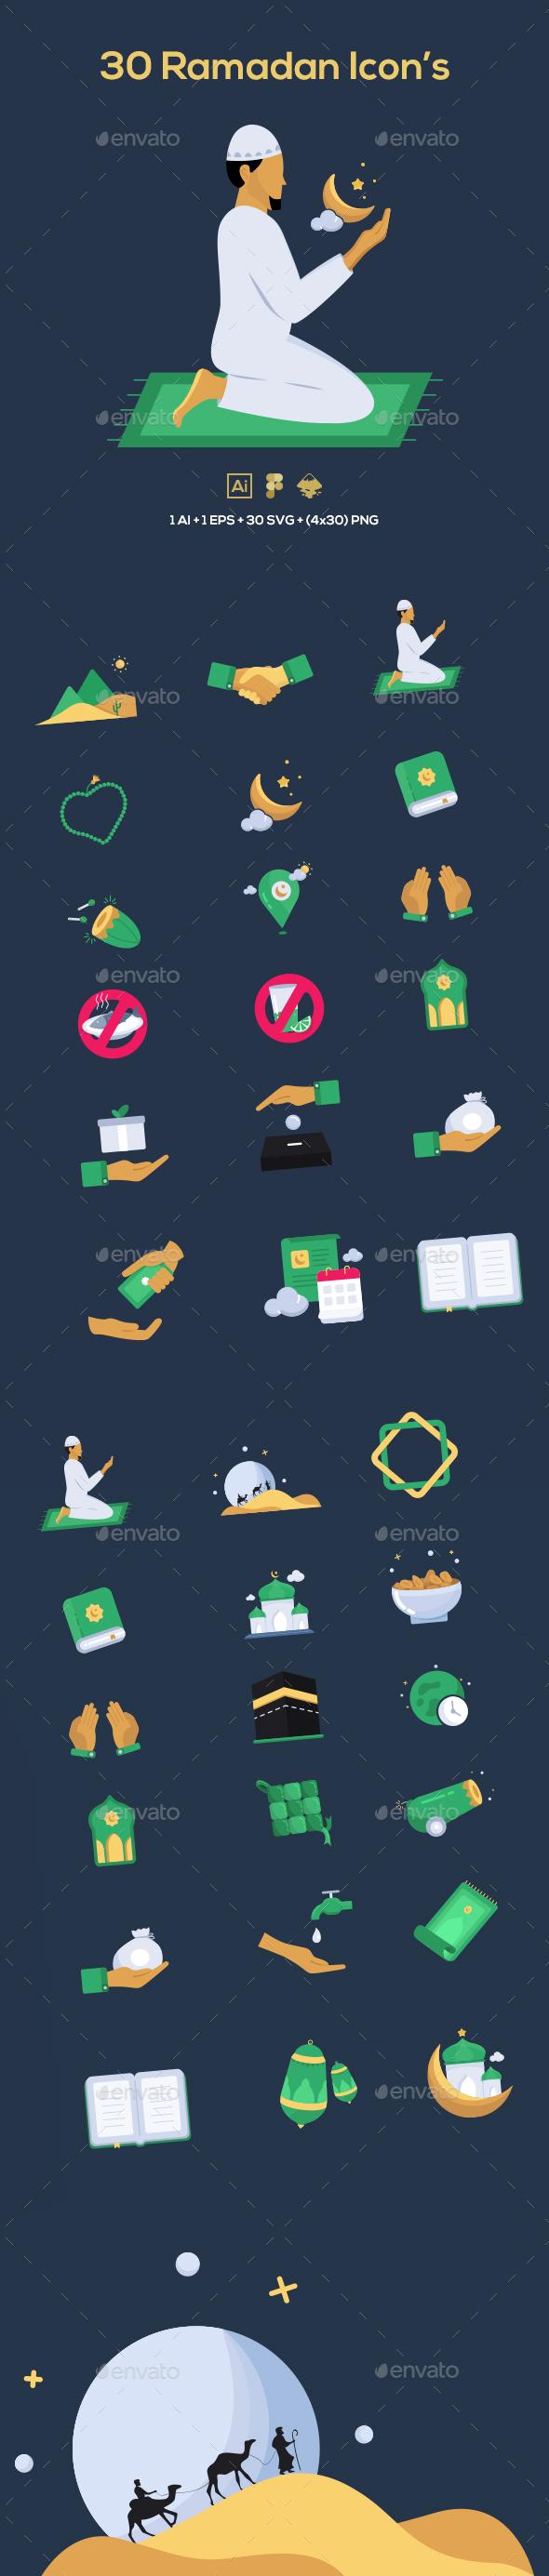 30 Ramadan Icons